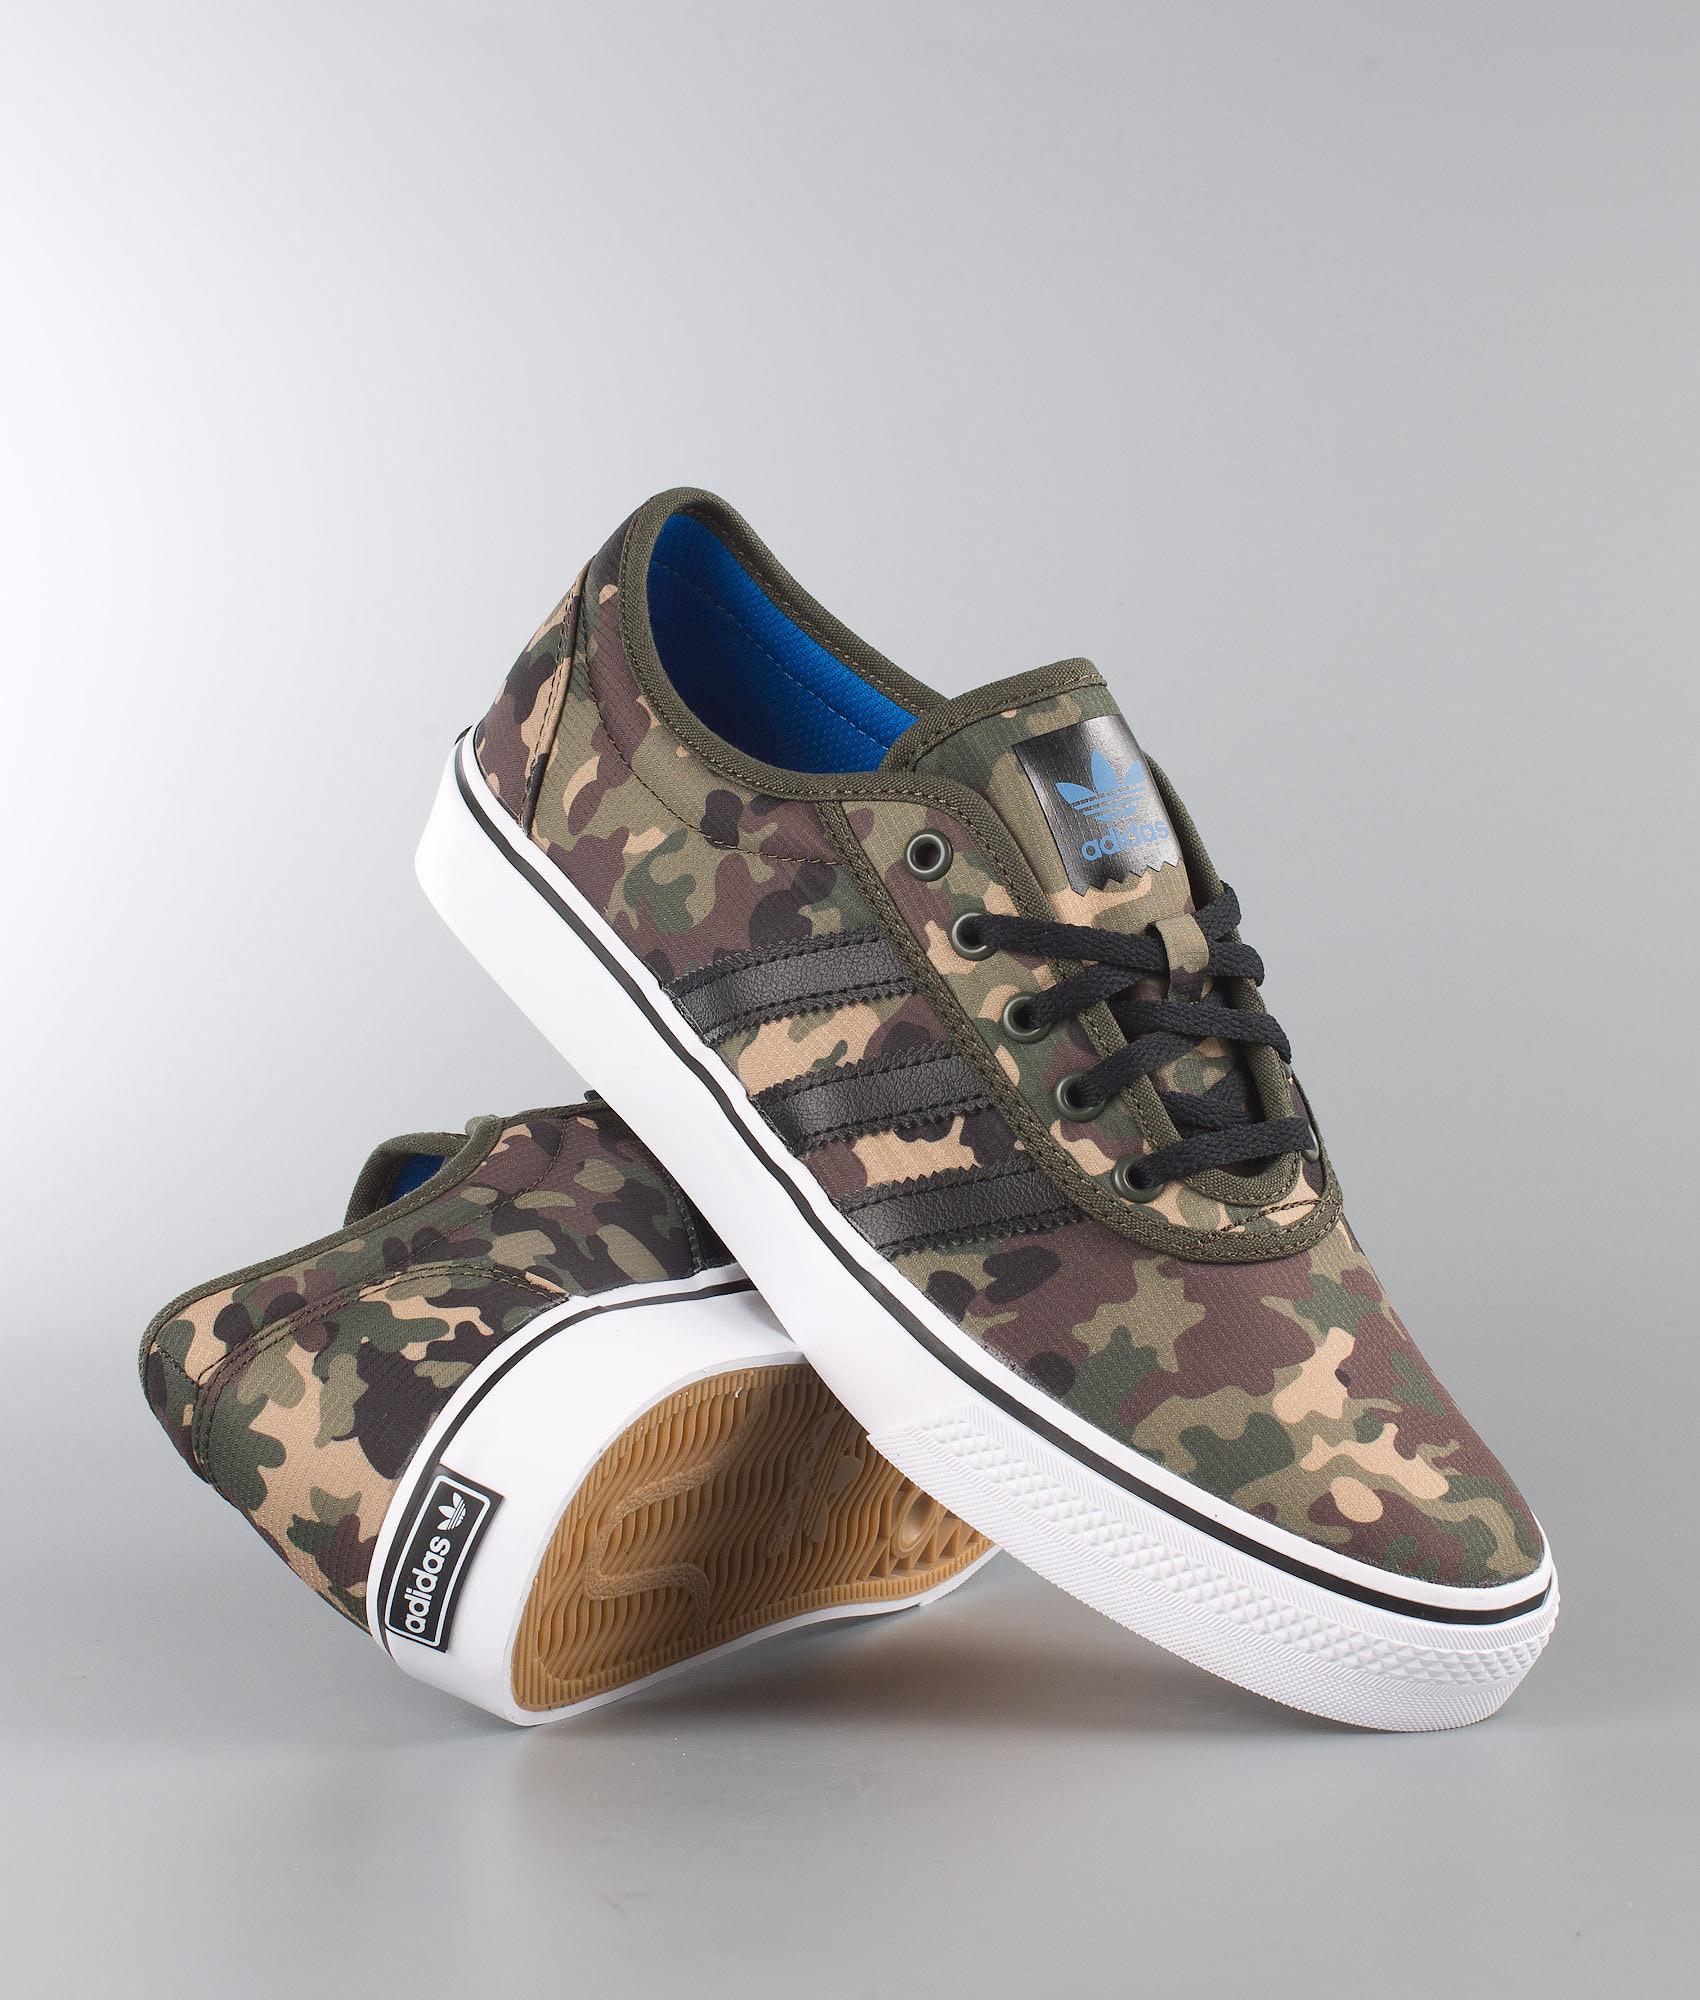 5d3e48247110 Adidas Skateboarding Adi-Ease Shoes Ngtcar Cblack Ftwwht - Ridestore.com